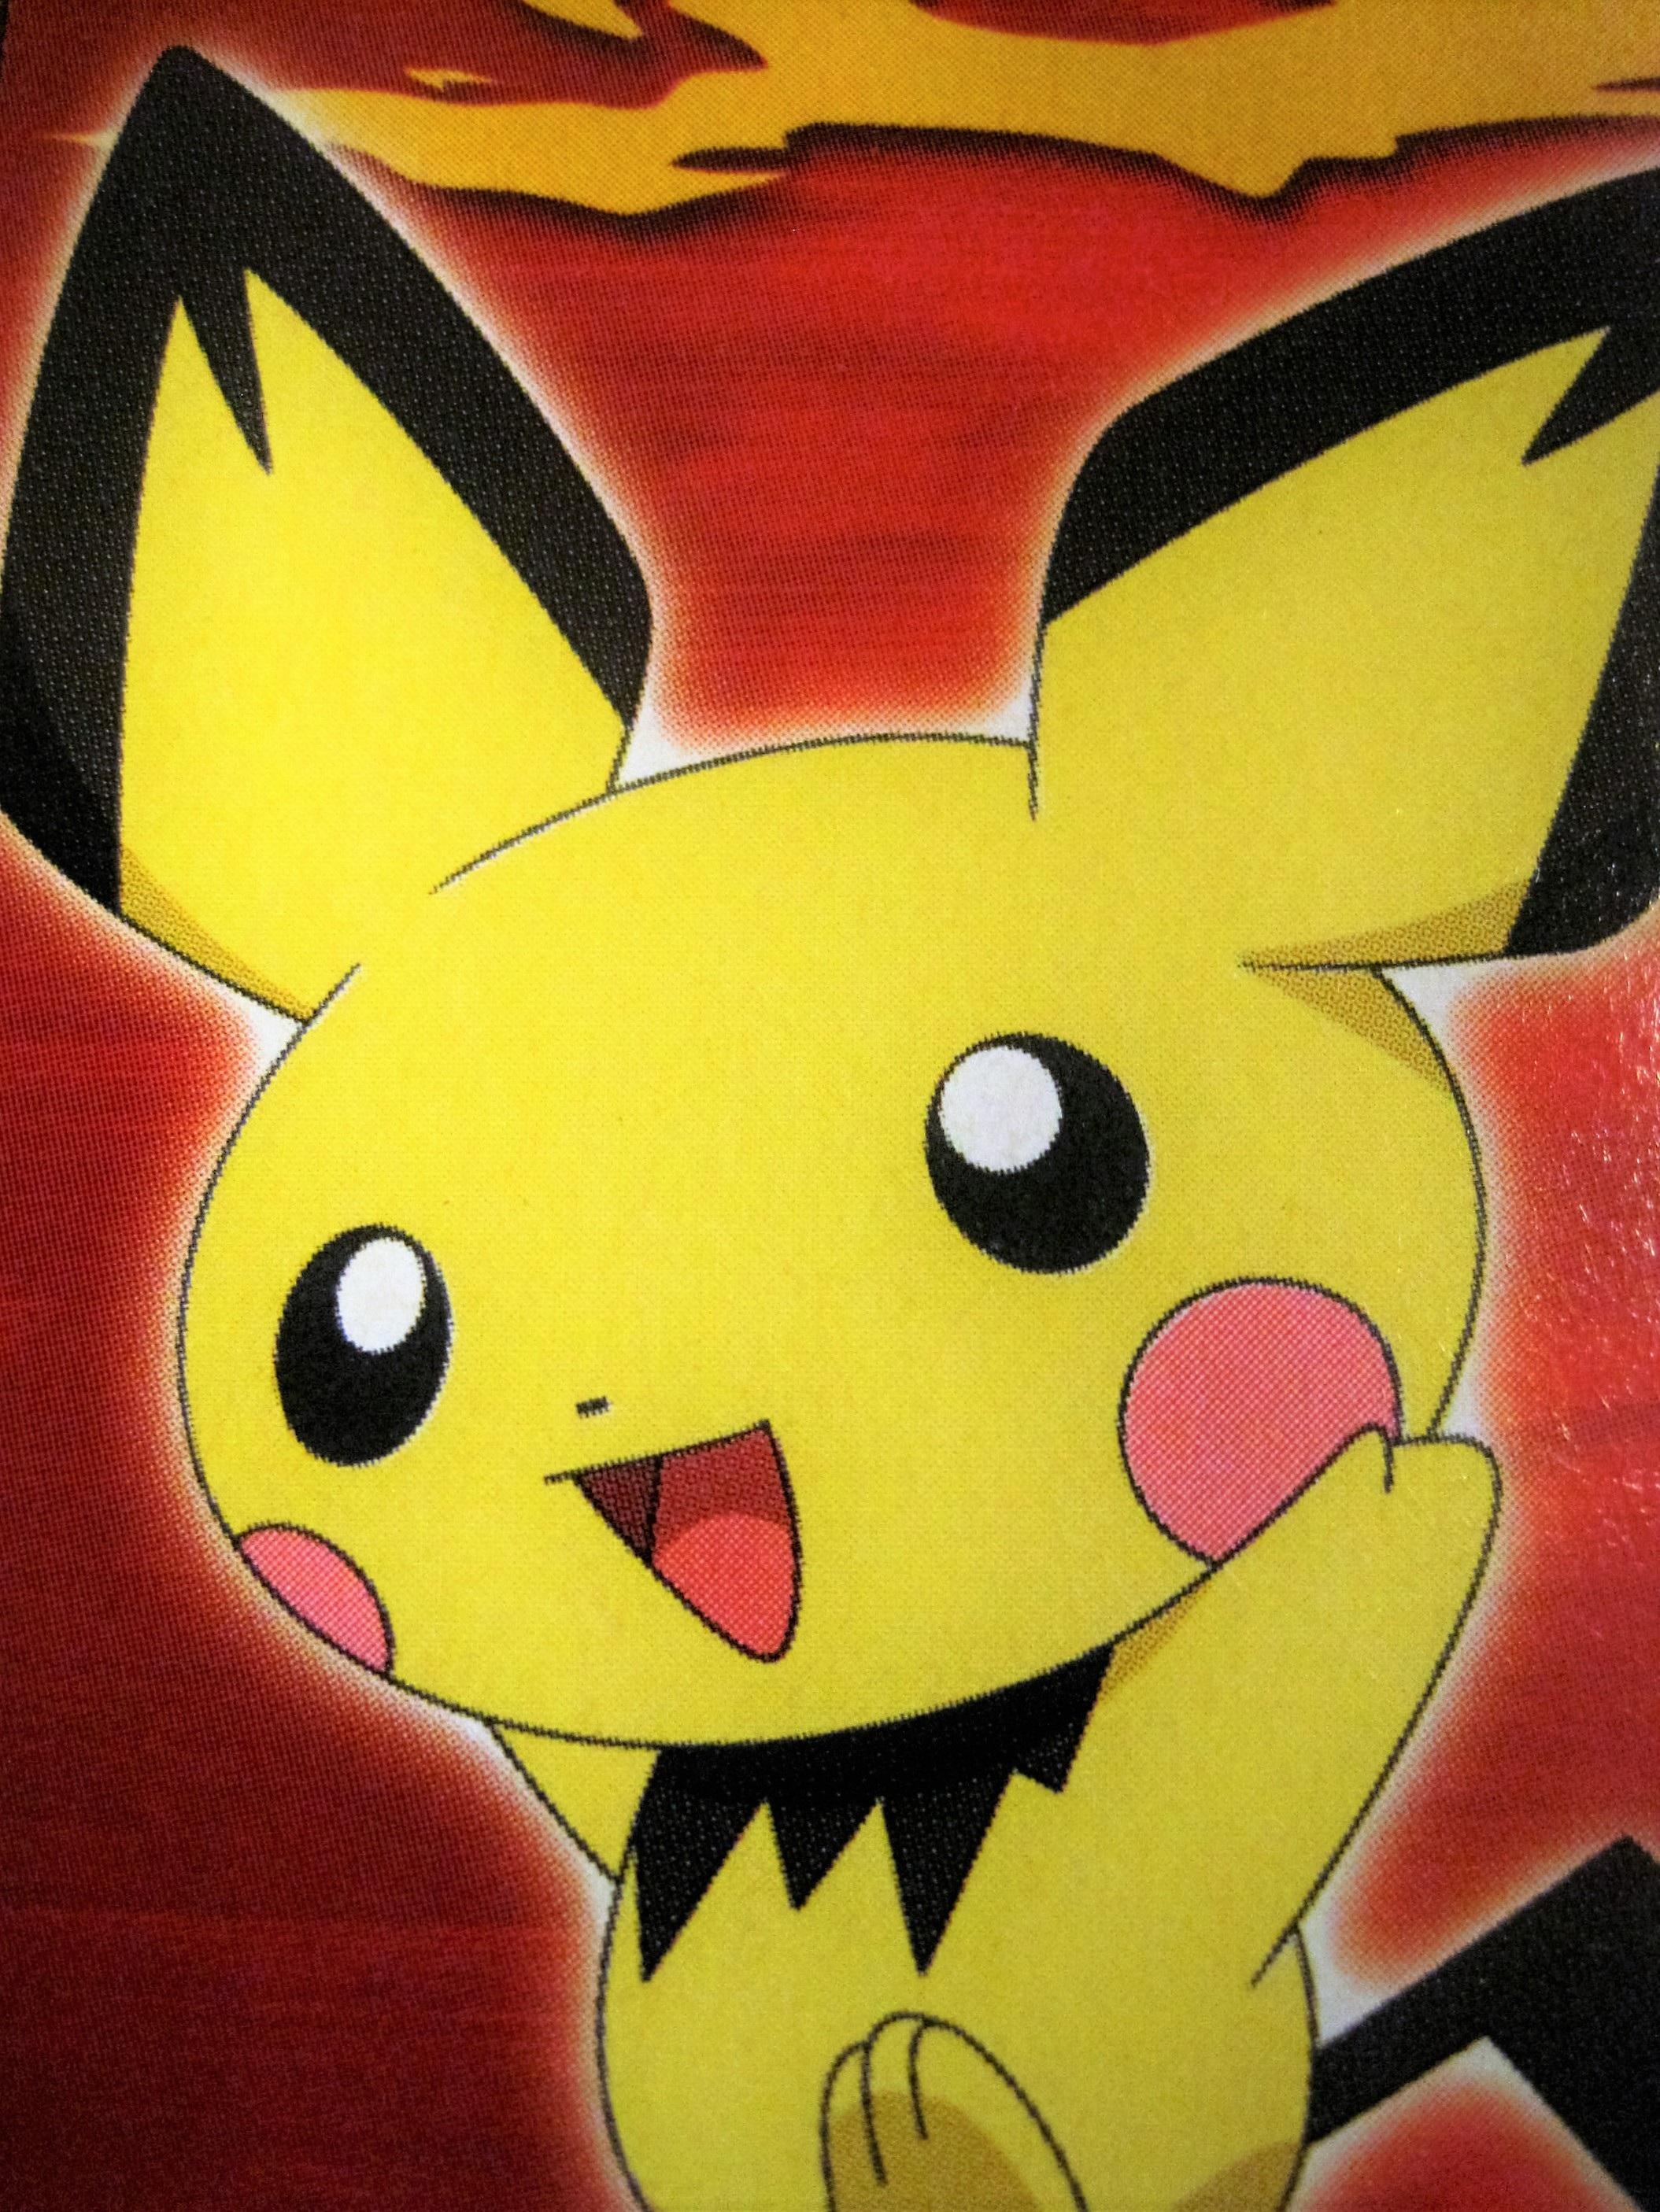 Gambar Warna Kuning Angka Ilustrasi Jepang Pokemon Pergi